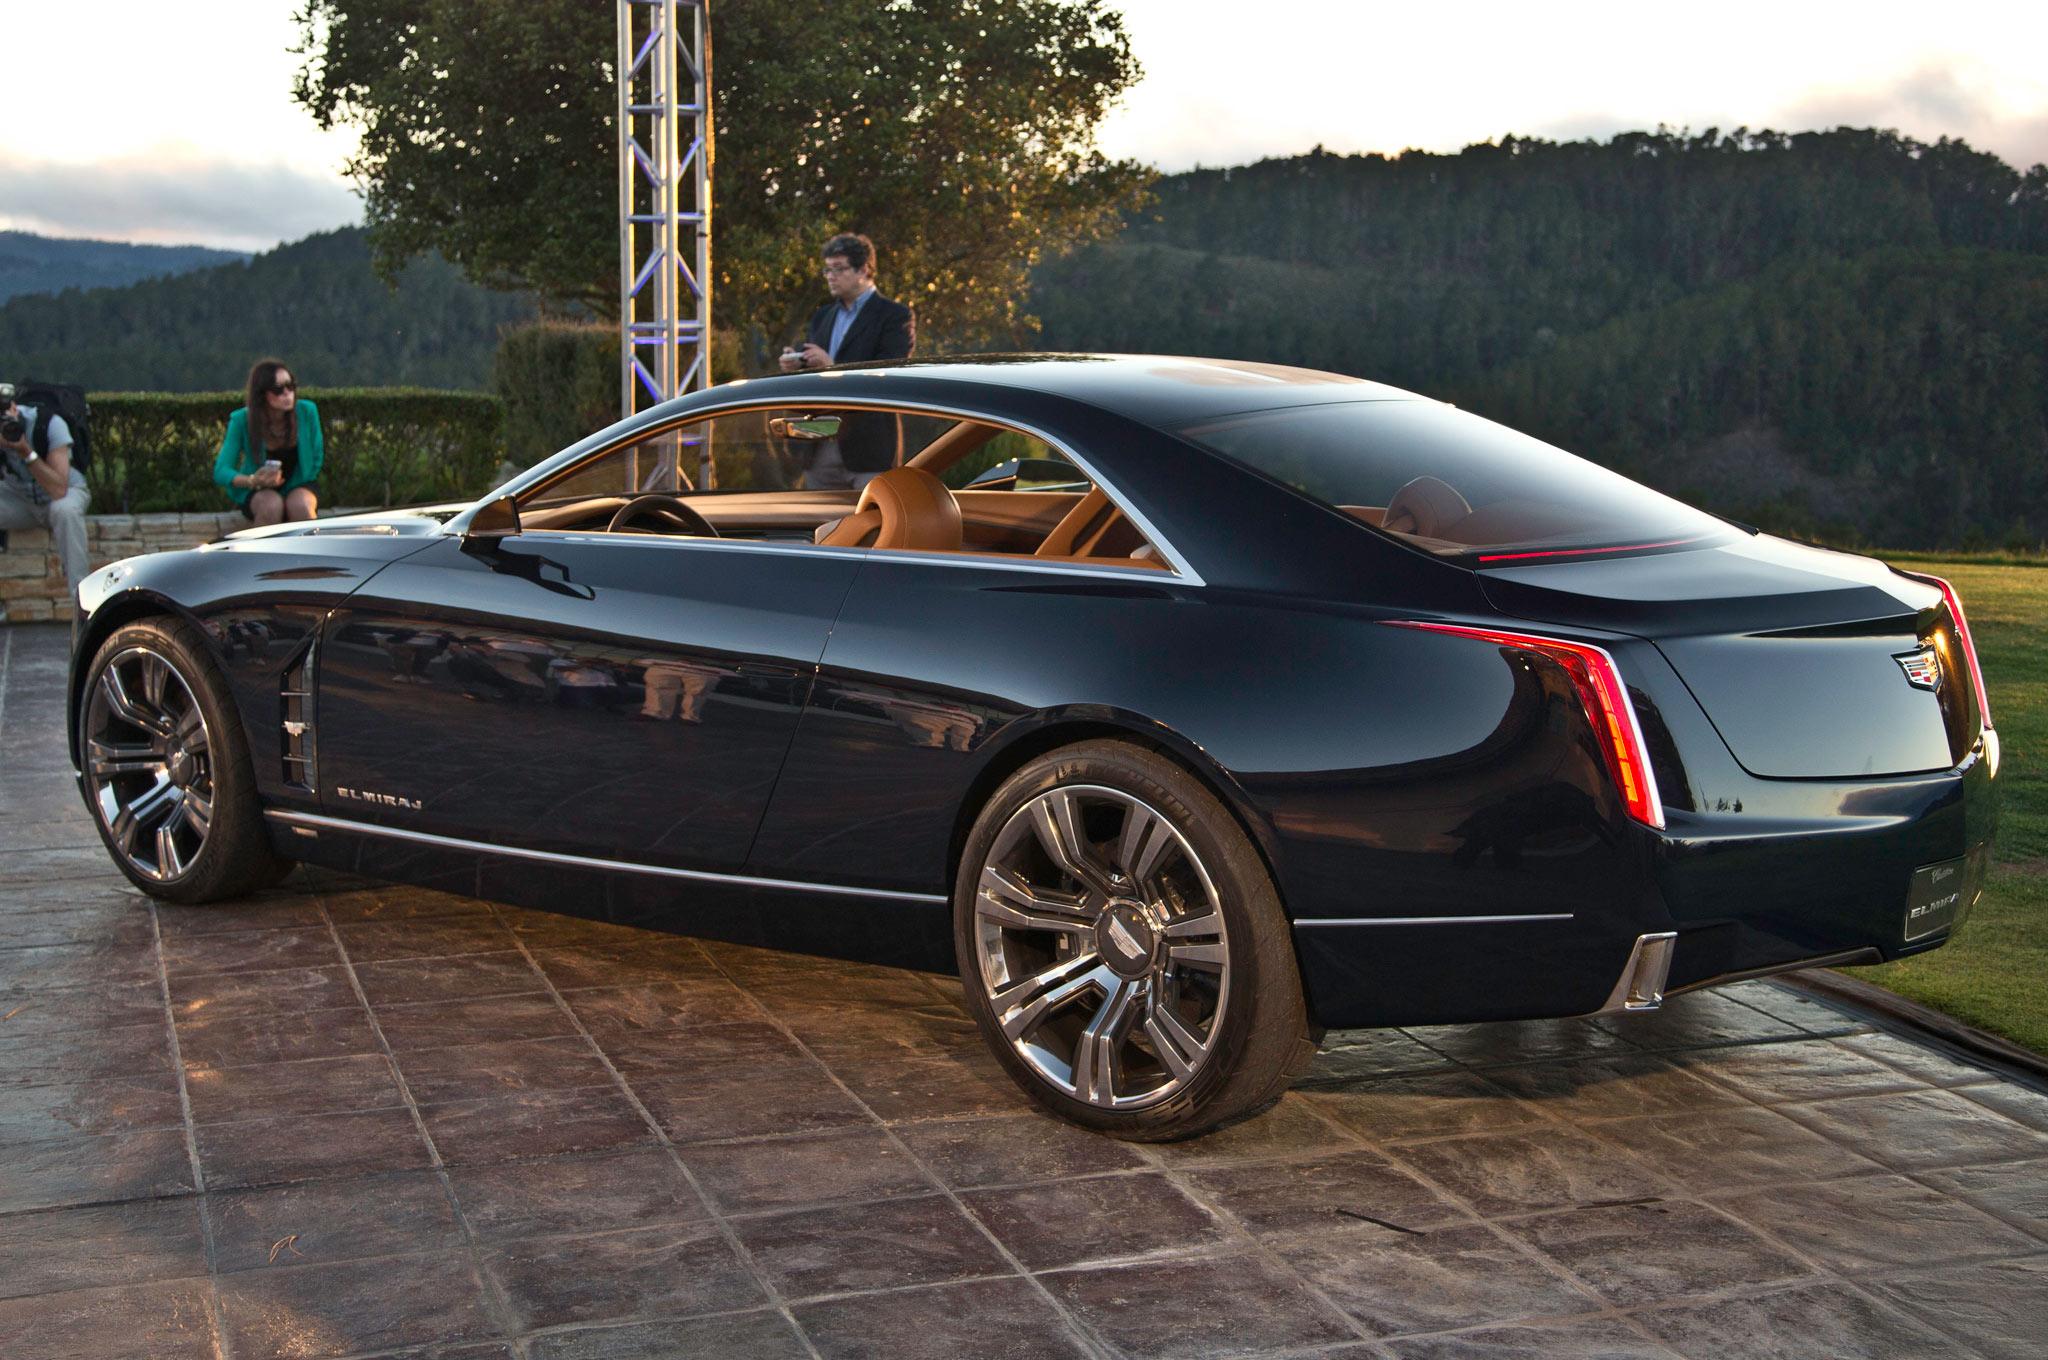 Cadillac Elmiraj Price >> 2013 Cadillac Elmiraj Concept Revealed At Pebble Beach